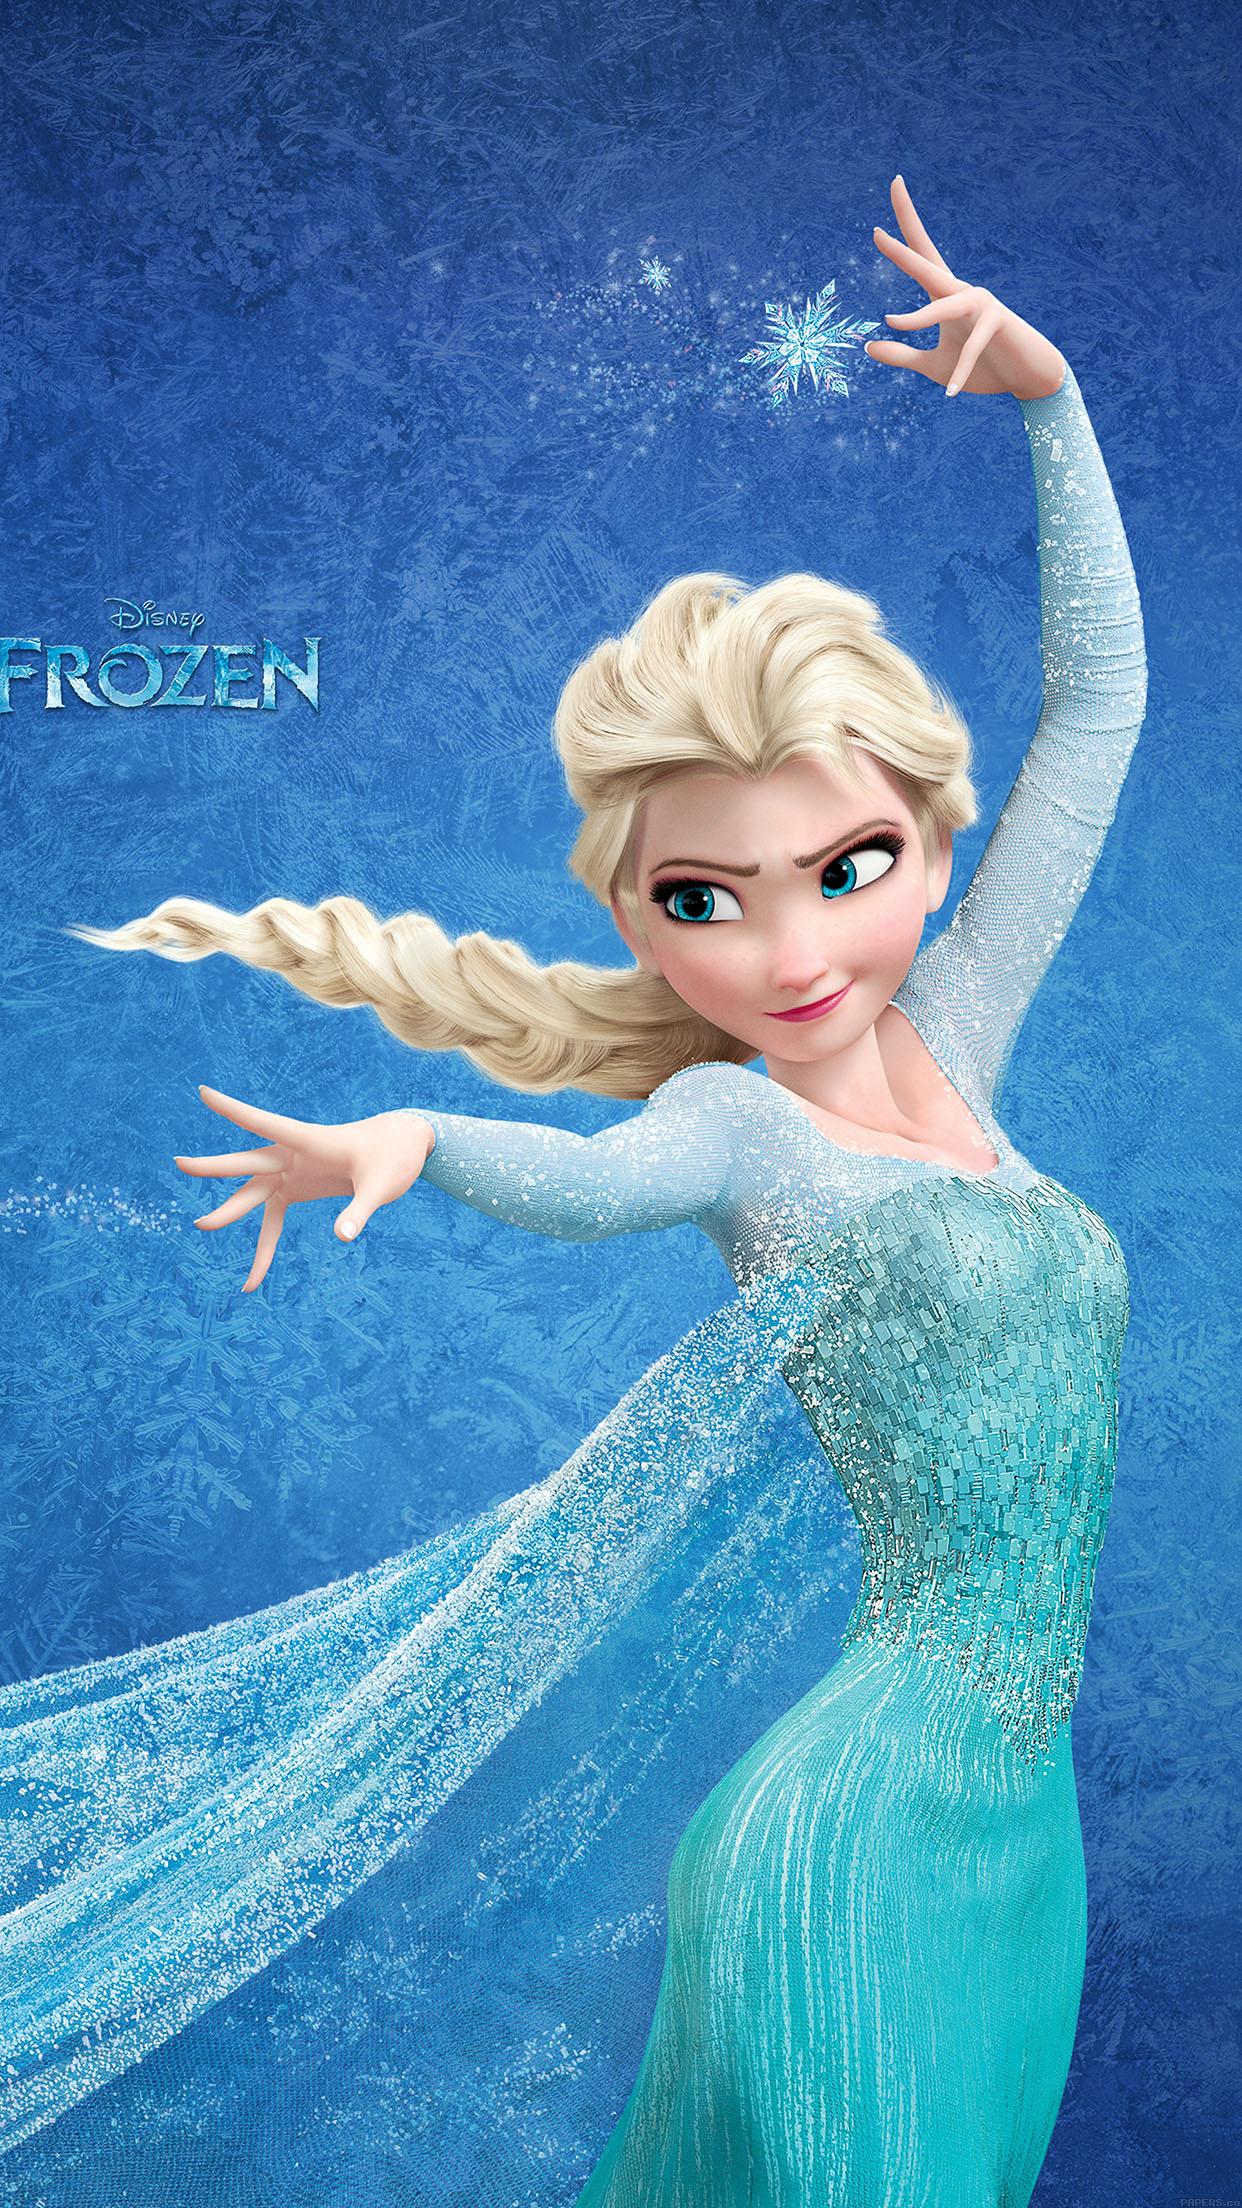 Papers Co Iphone Wallpaper Ab73 Wallpaper Frozen Elsa